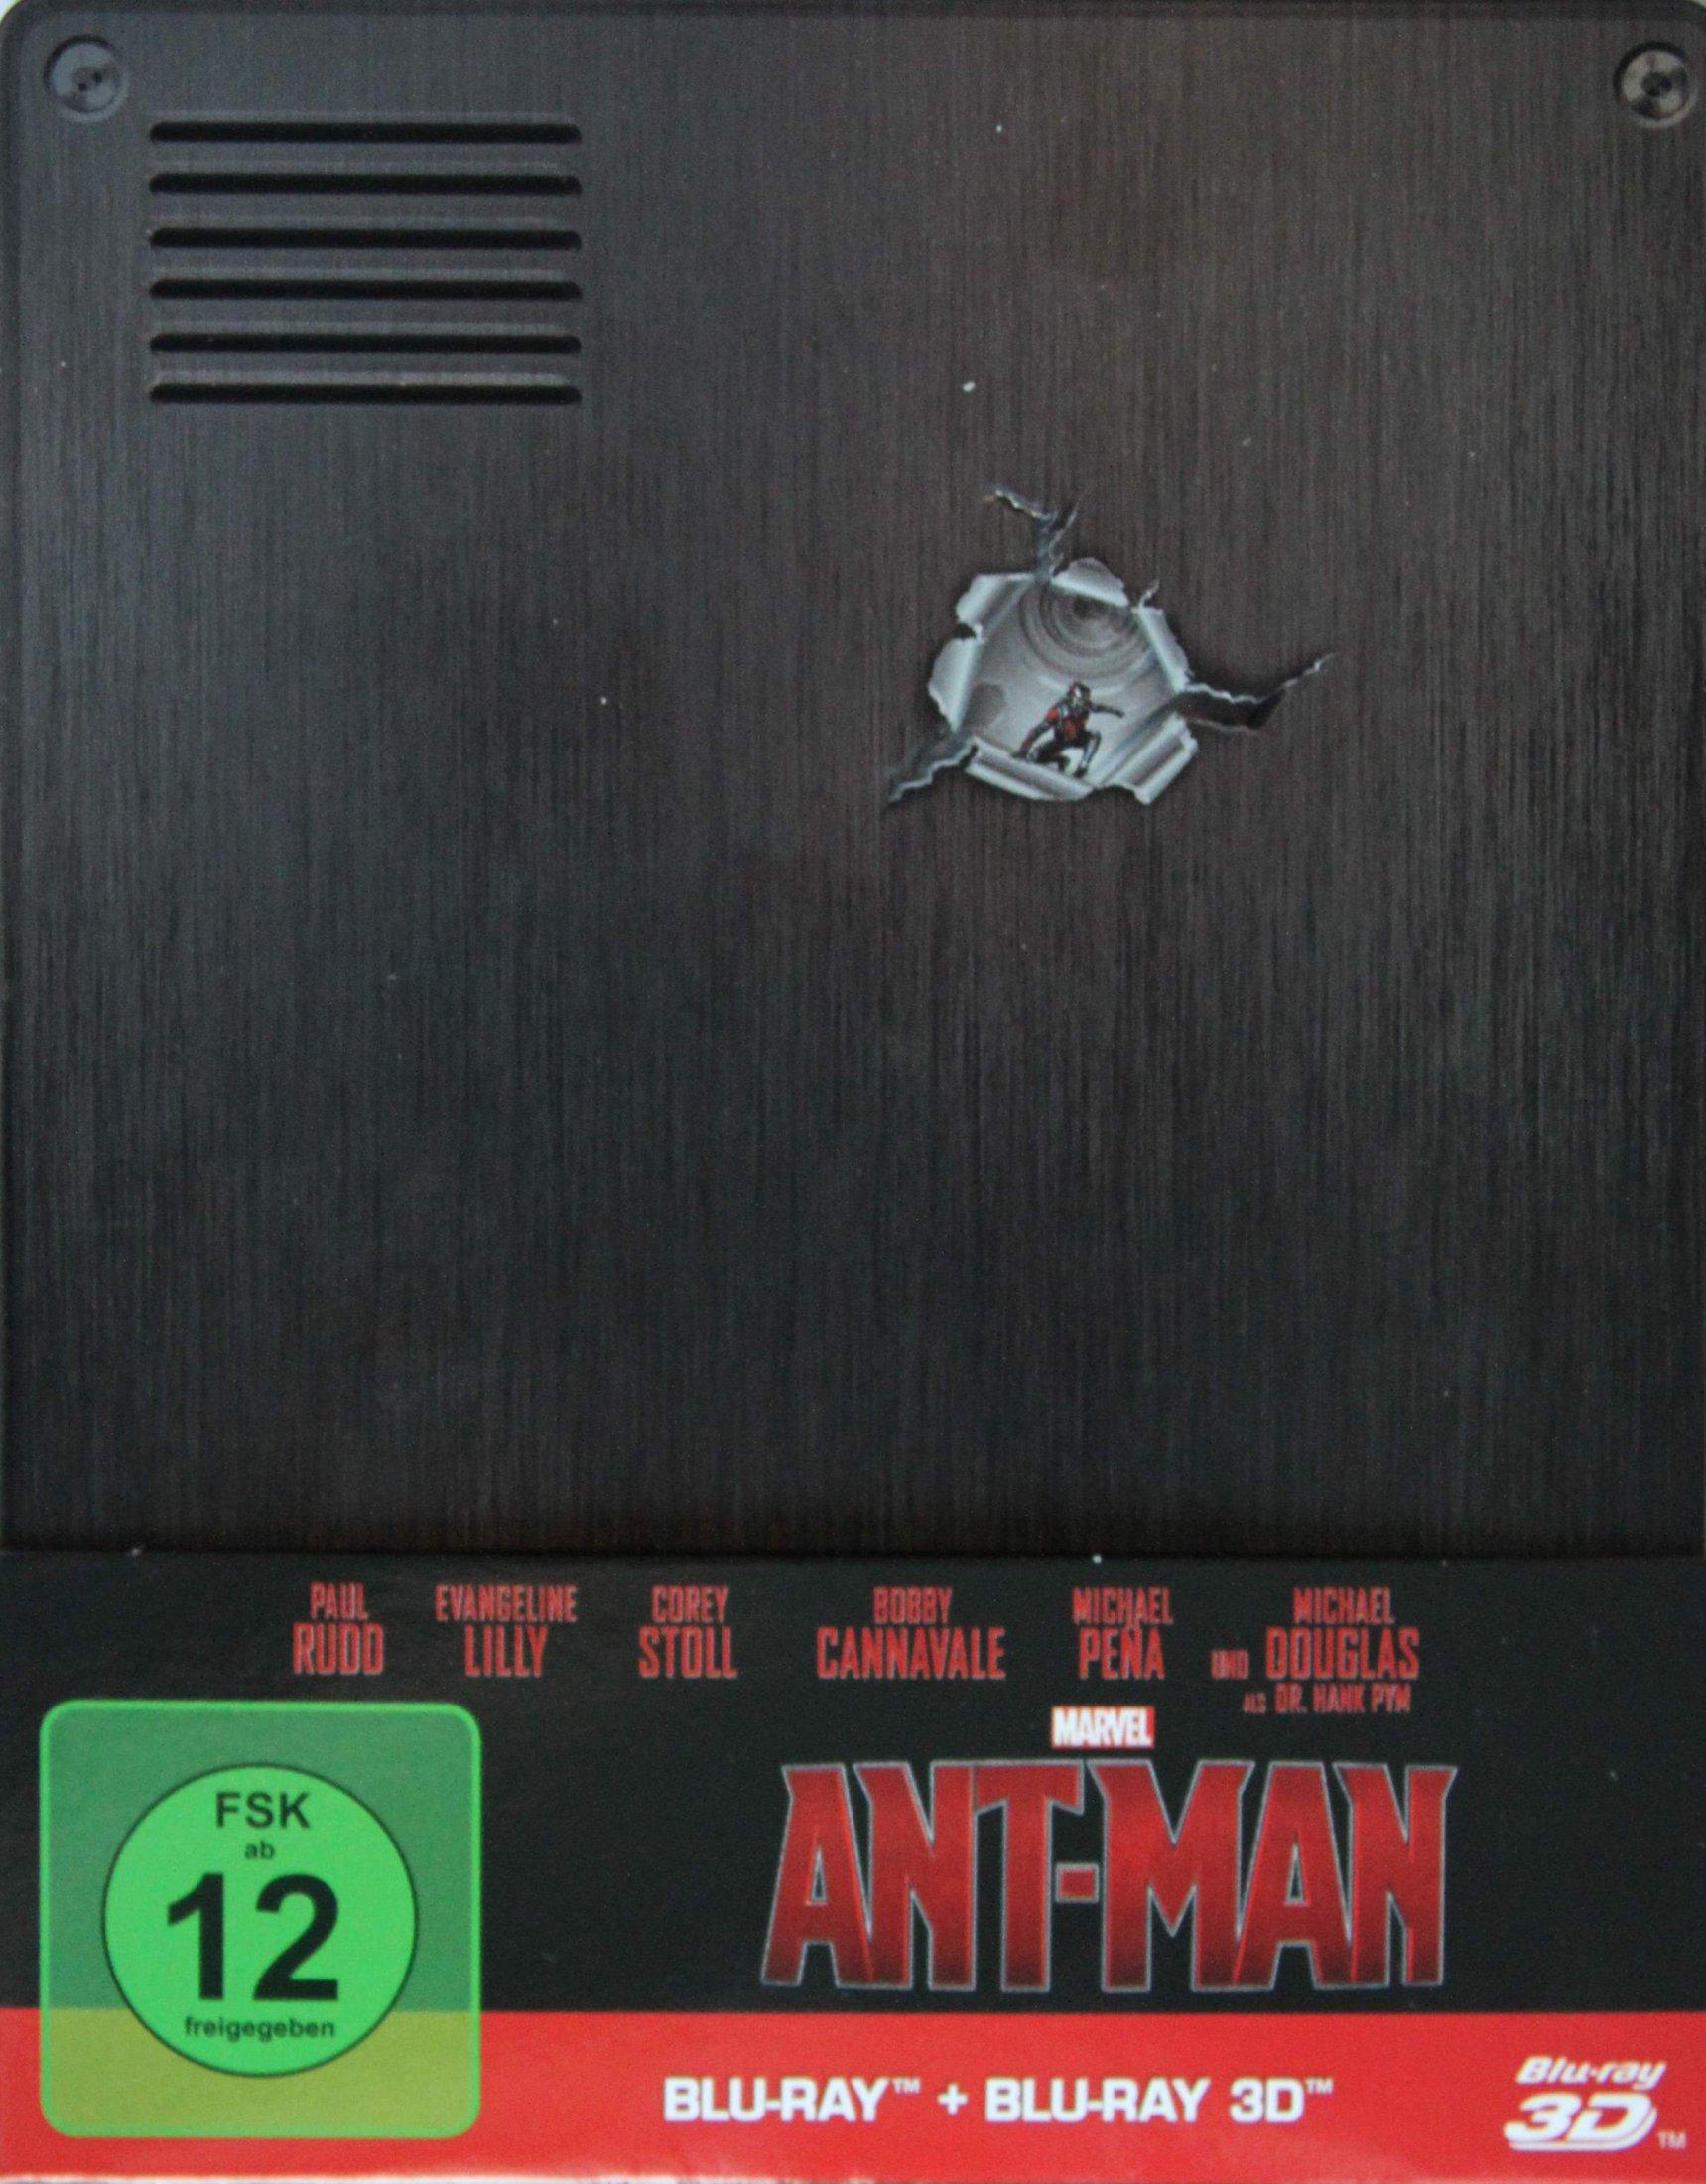 Ant-Man Steelbook Paperback vorderseite